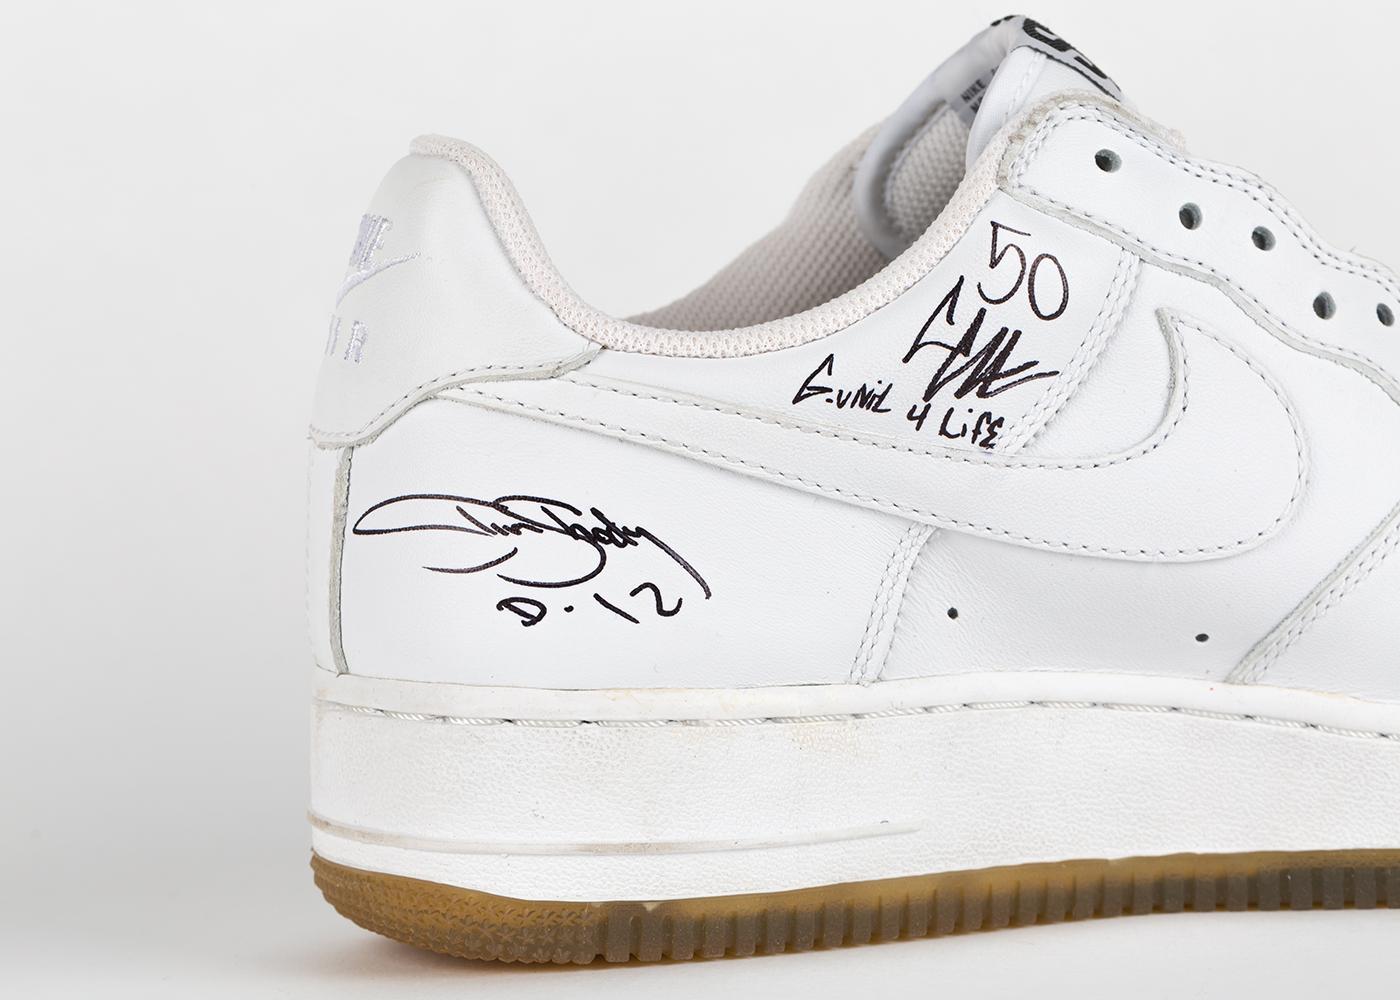 0ae8f8412517dd Eminem приготовил перевыпуск легендарных кроссовок Jordan 4 Encore ...